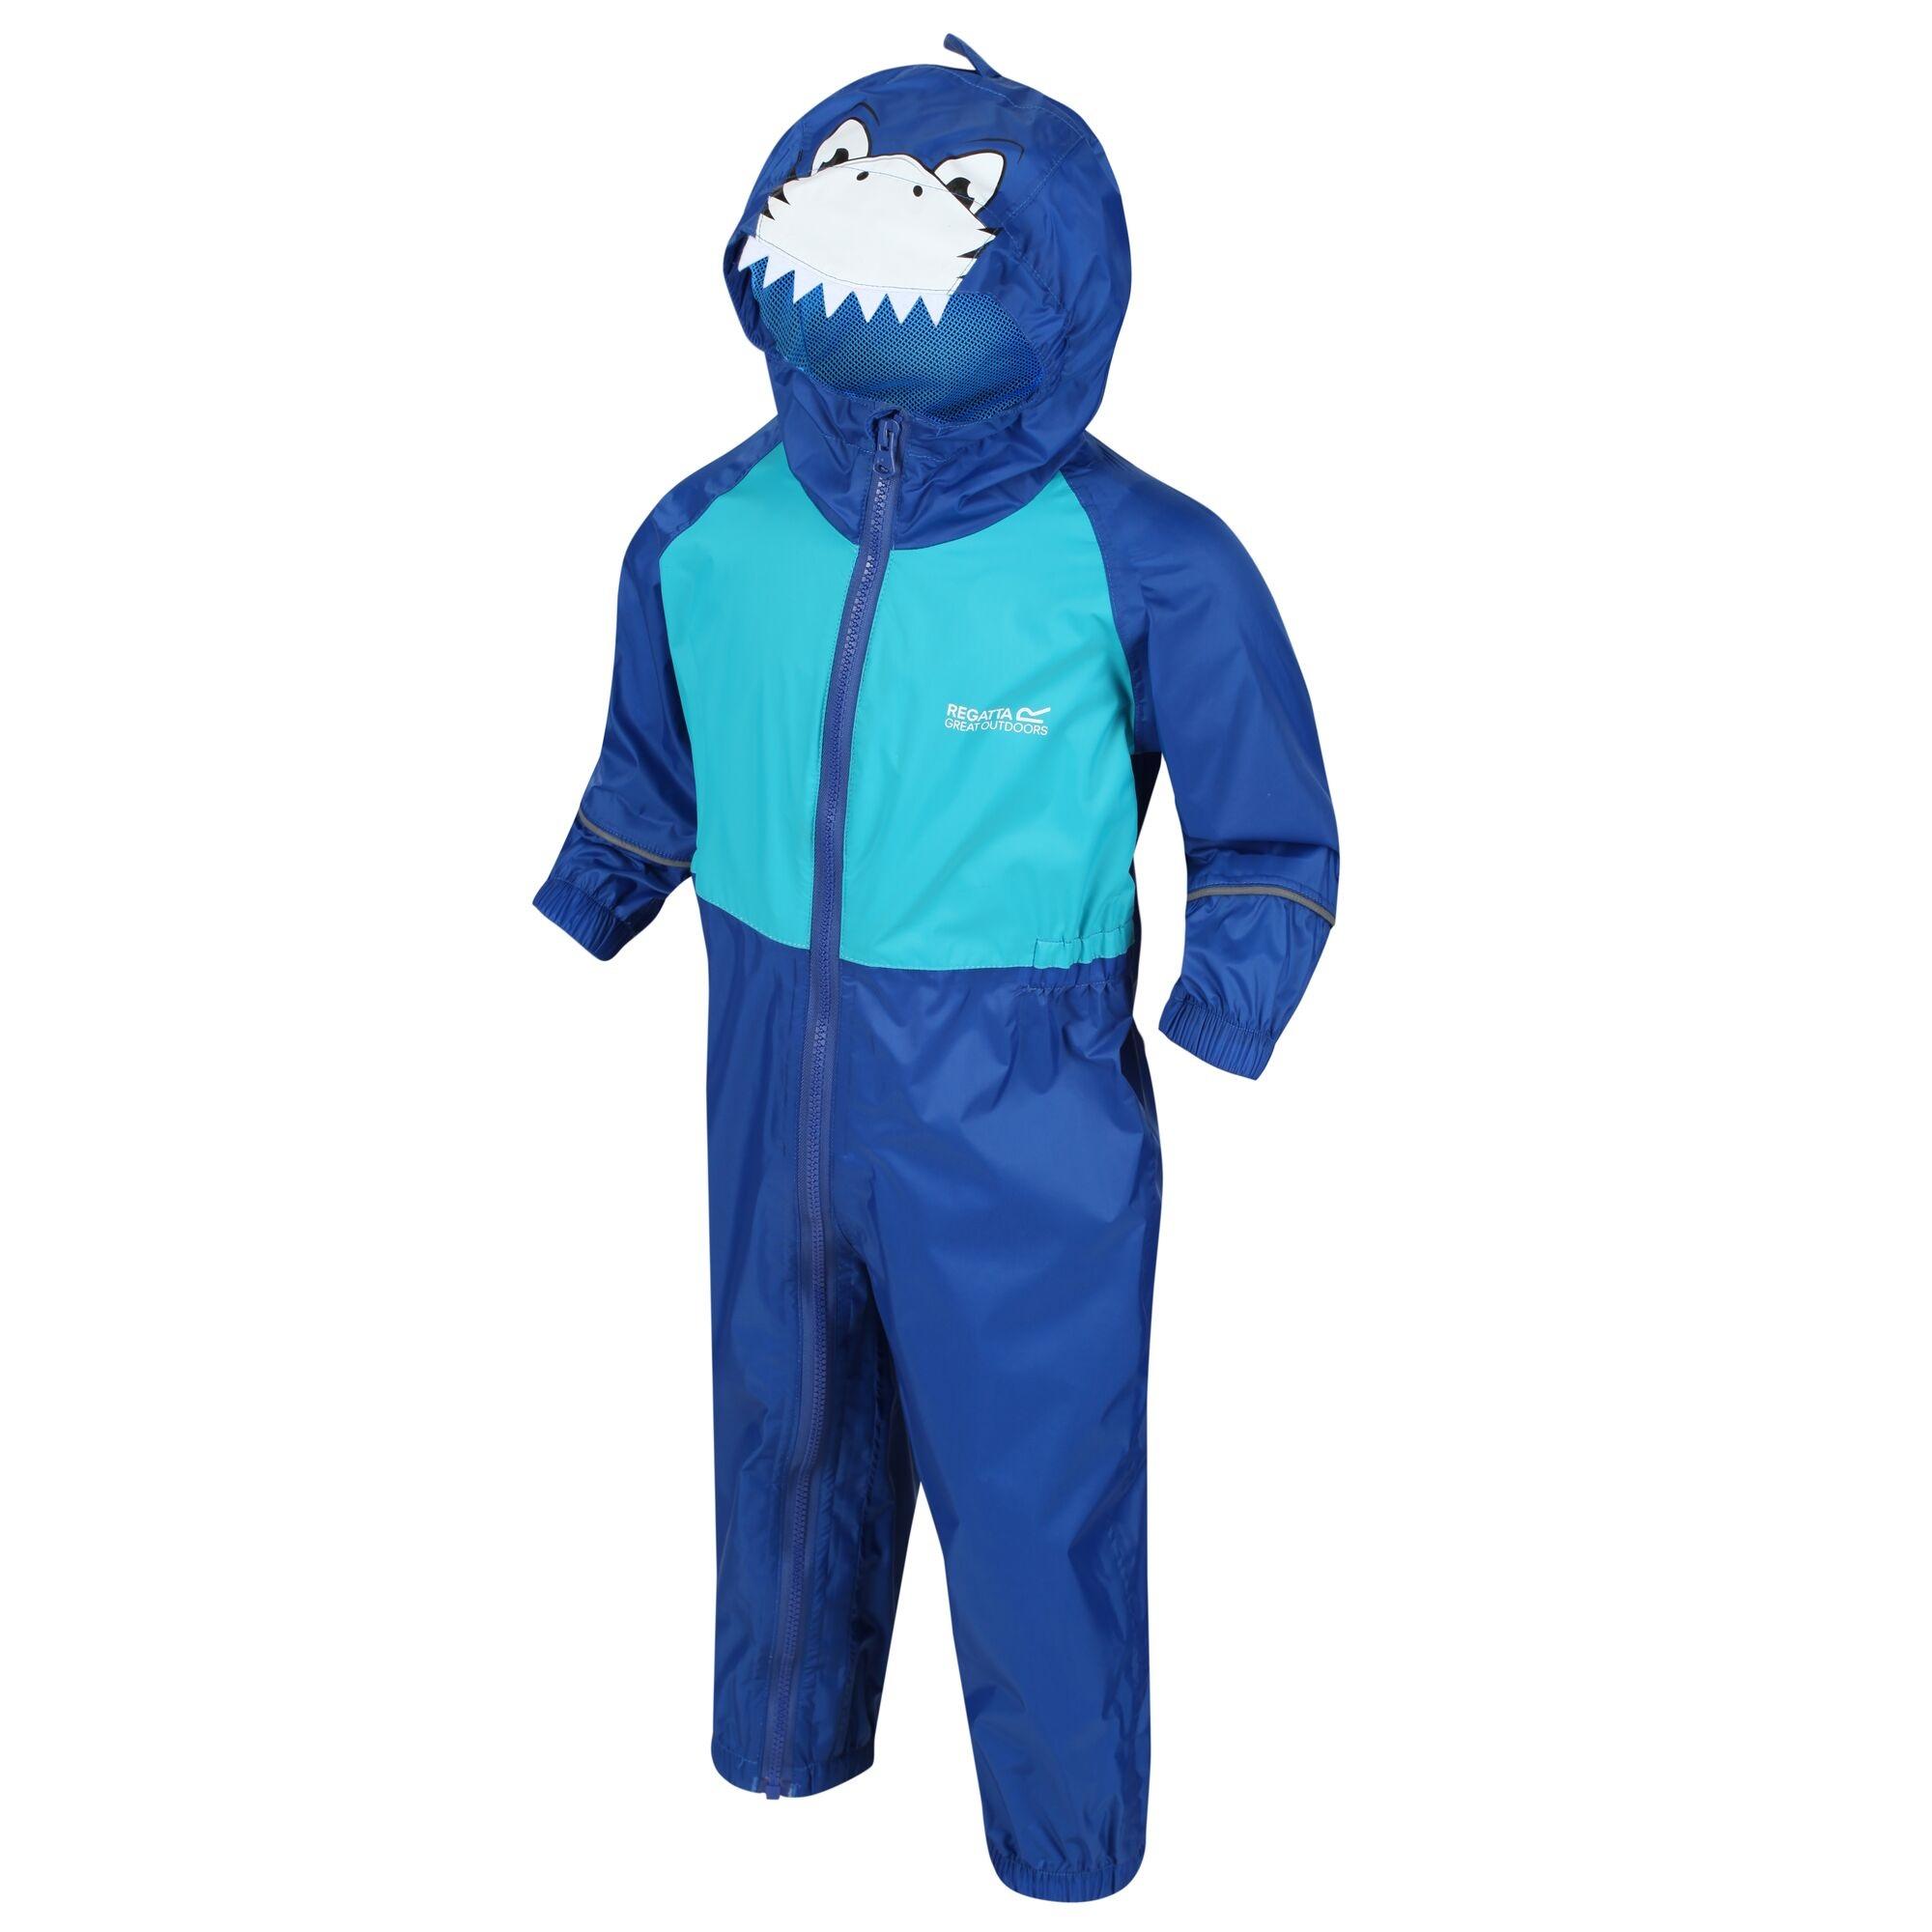 Regatta Great Outdoors Kids Charco Waterproof Rain Suit (36-48 Months) (Nautical Blue/Washed Azure)